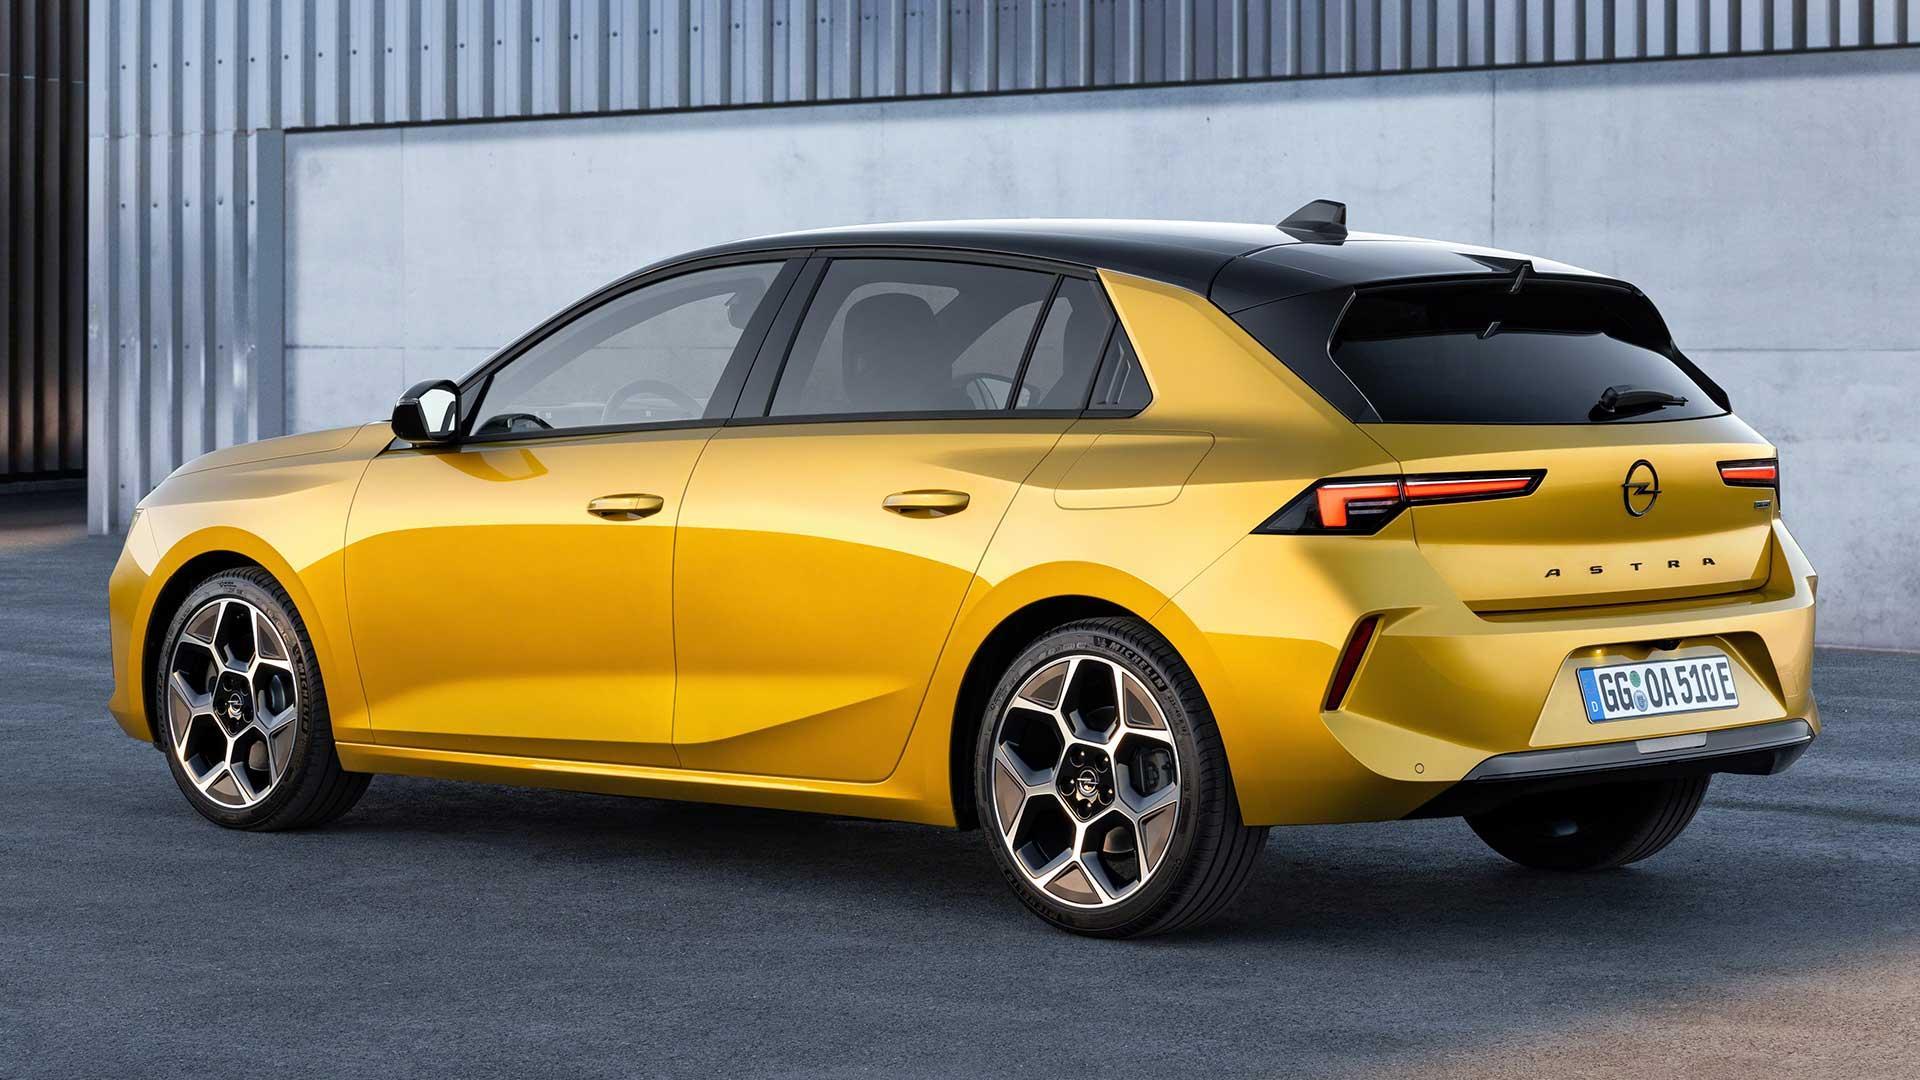 Achterkant Opel Astra (2021)